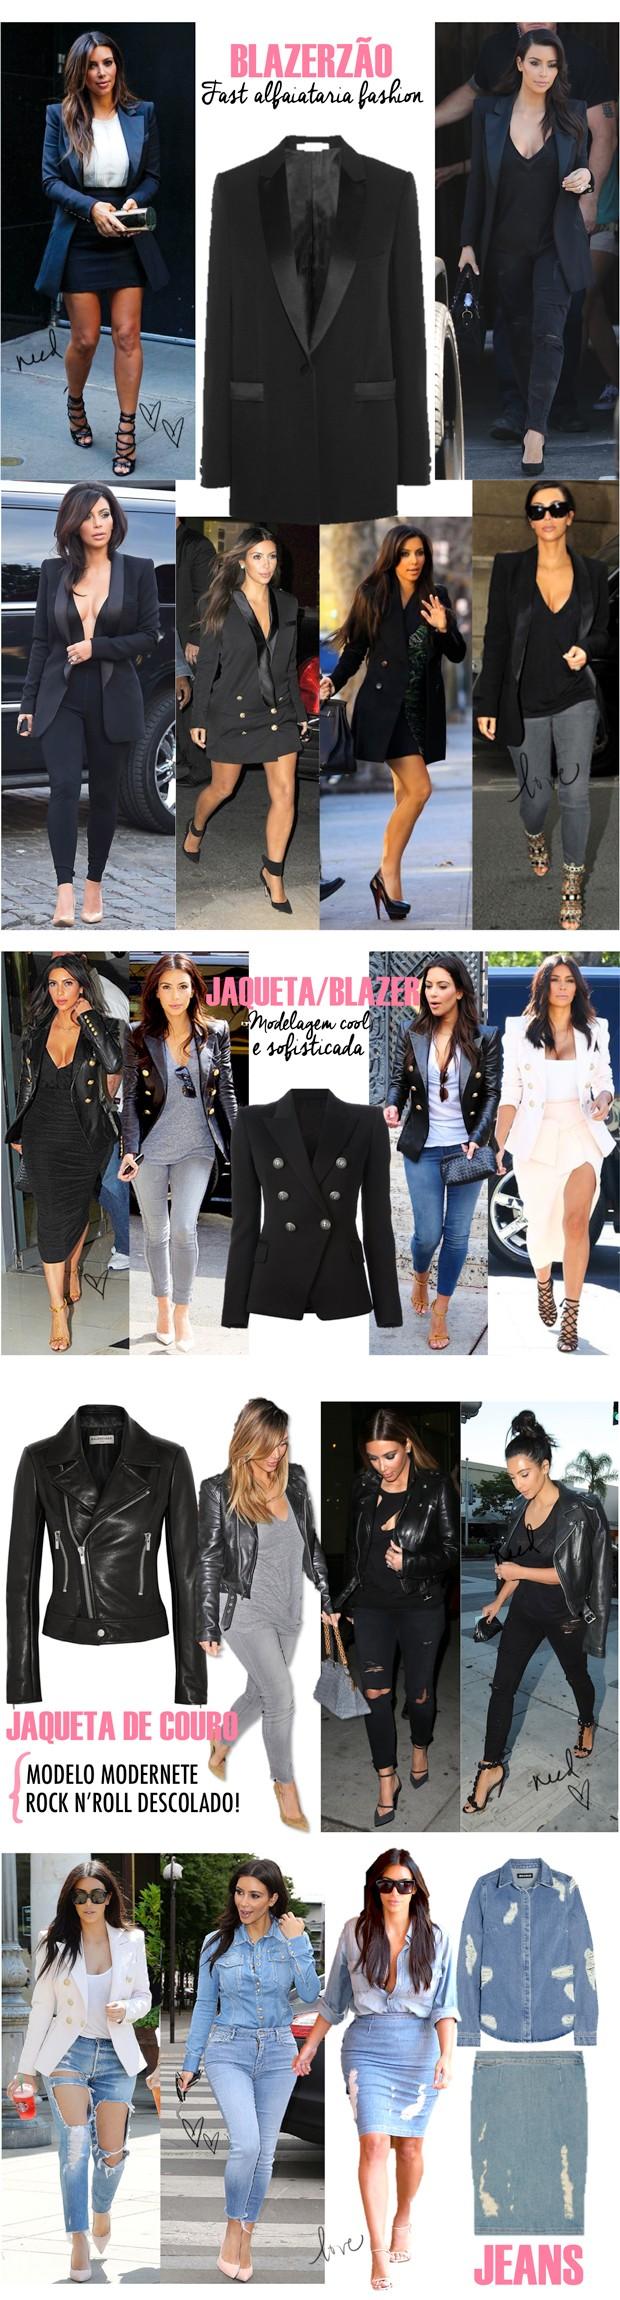 kim-kardashian-cea-2